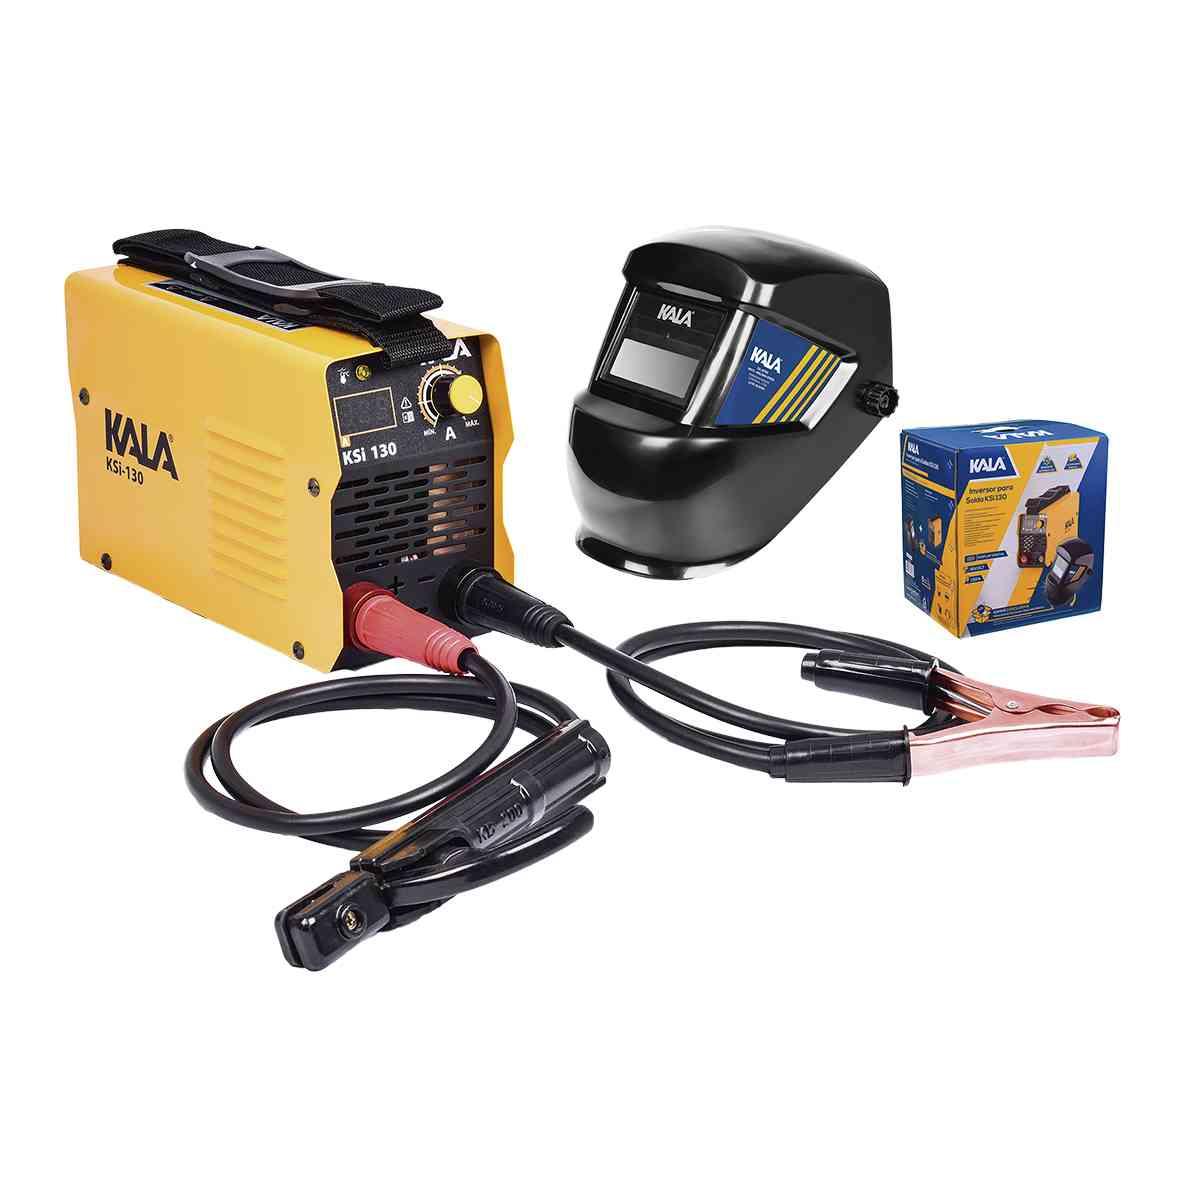 Kit Inversor de Solda 130A Ksi 130 Bivolt + Máscara - Kala